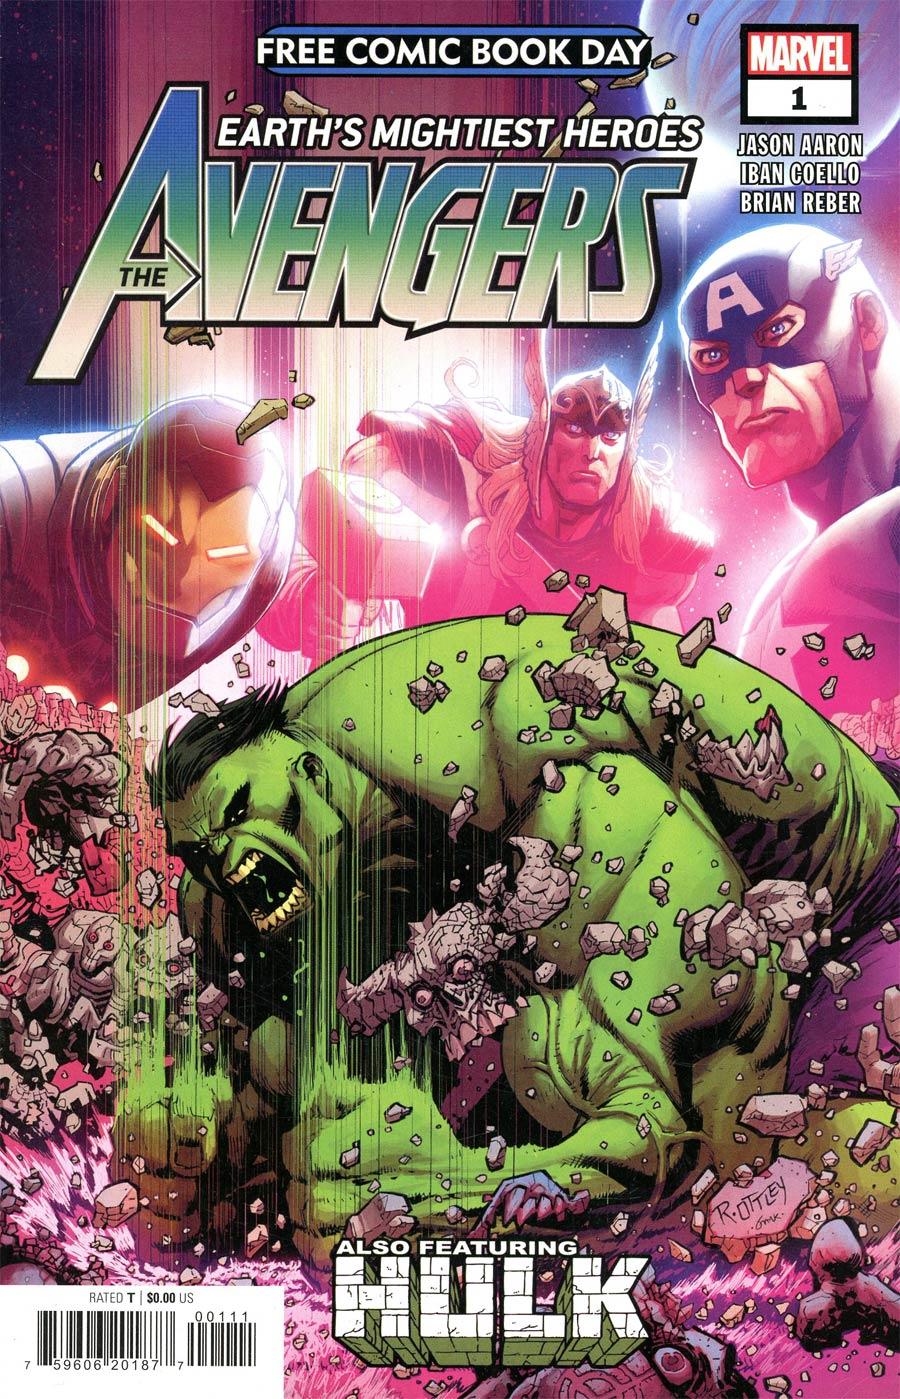 Avengers Hulk #1 FCBD 2021 Edition